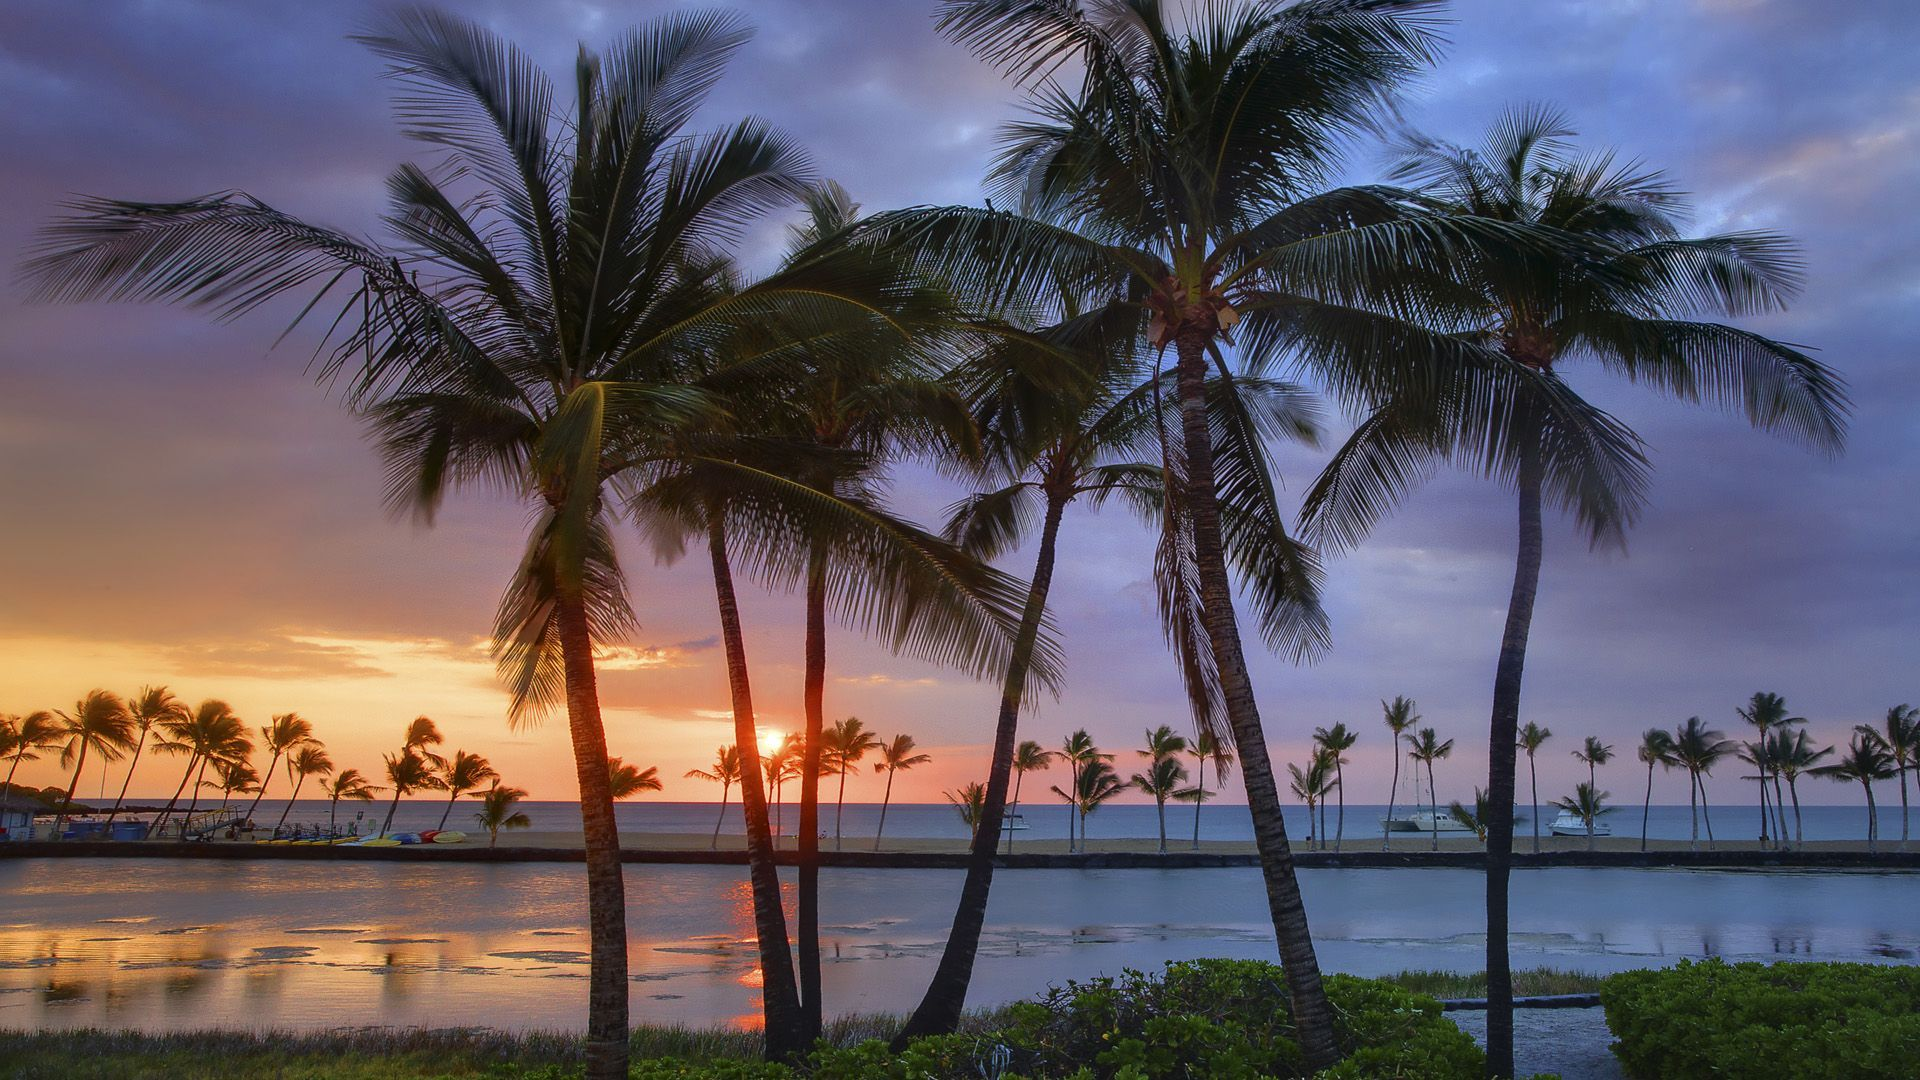 Hawaiian sunset wallpaper   315108 1920x1080